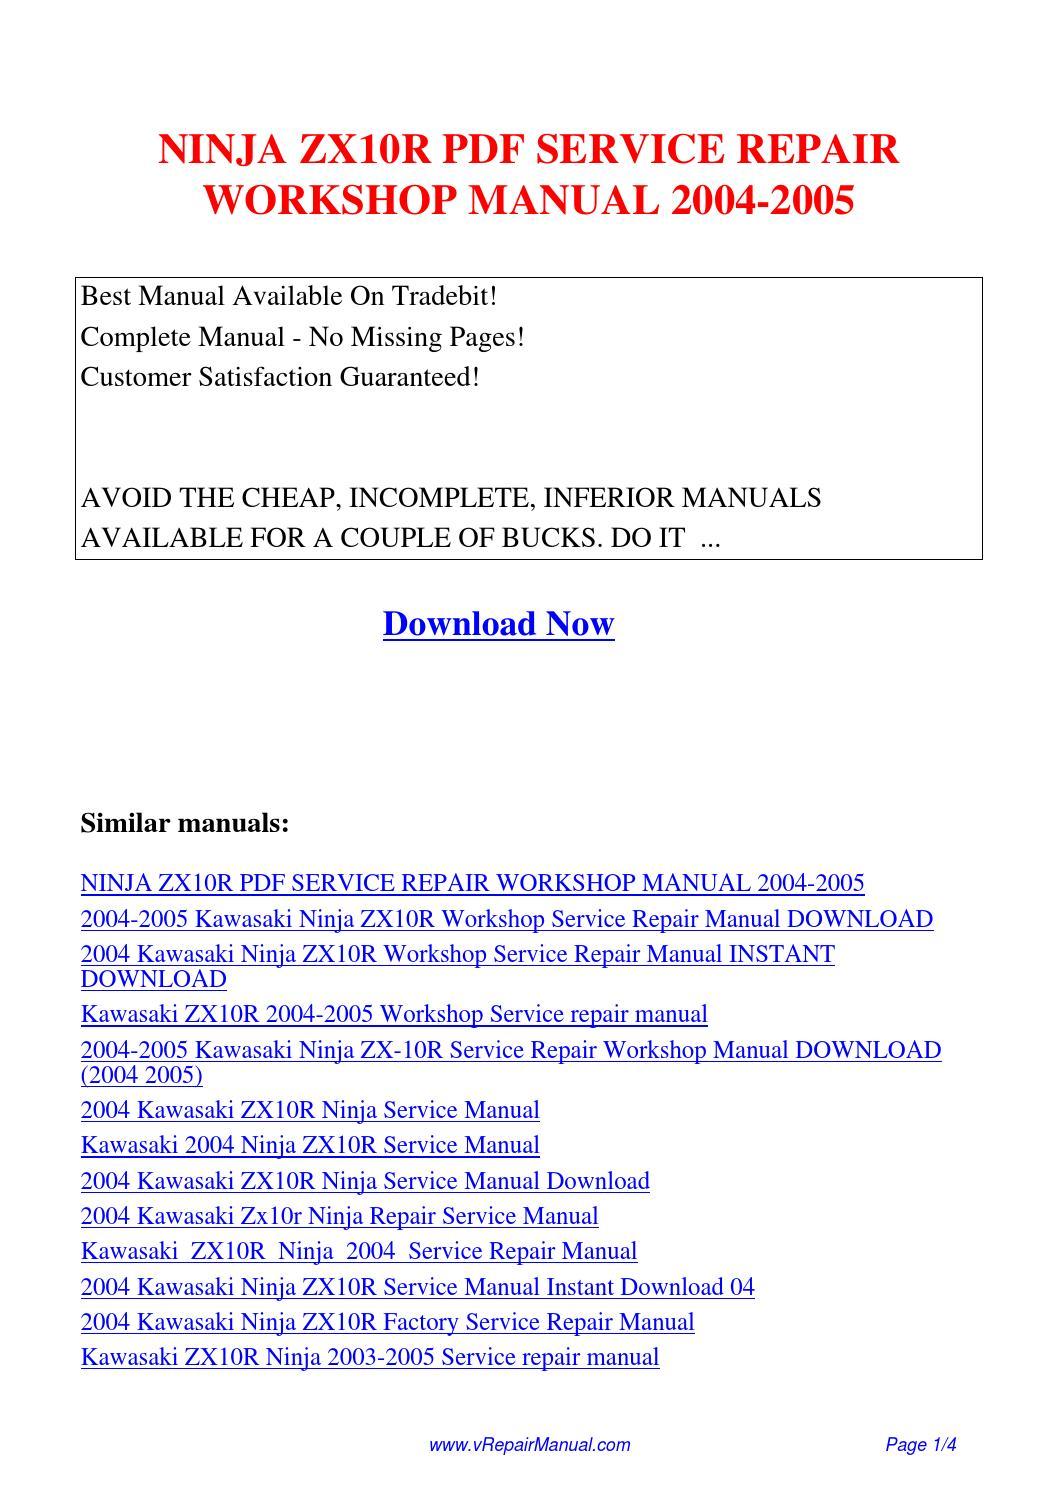 NINJA ZX10R SERVICE REPAIR WORKSHOP MANUAL 2004-2005.pdf by David Zhang -  issuu